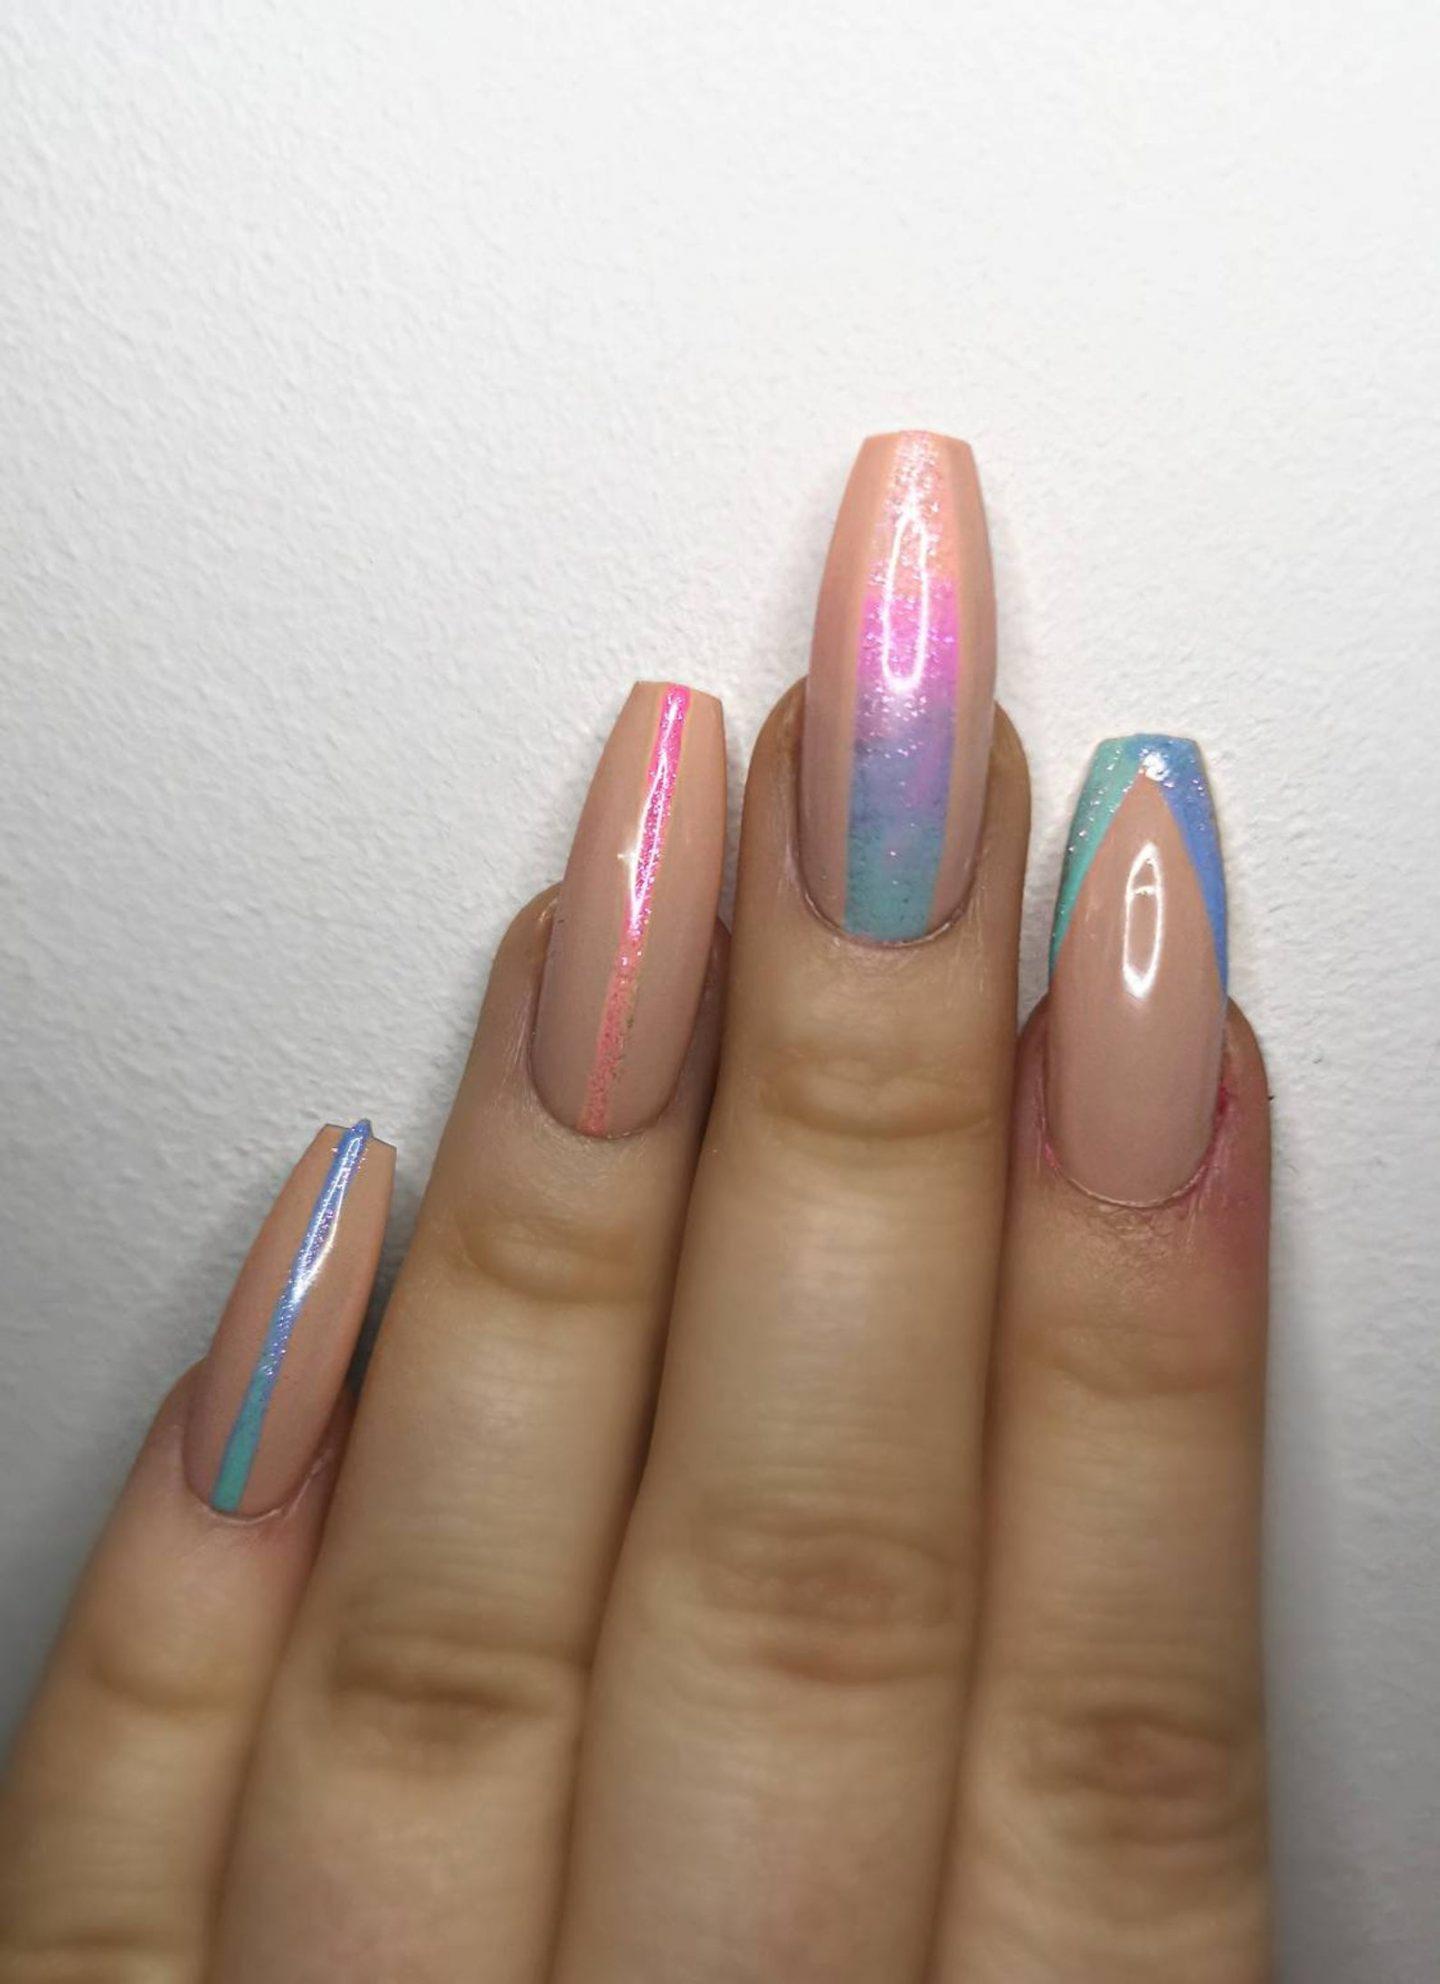 Rainbow nail art on coffin shape nails